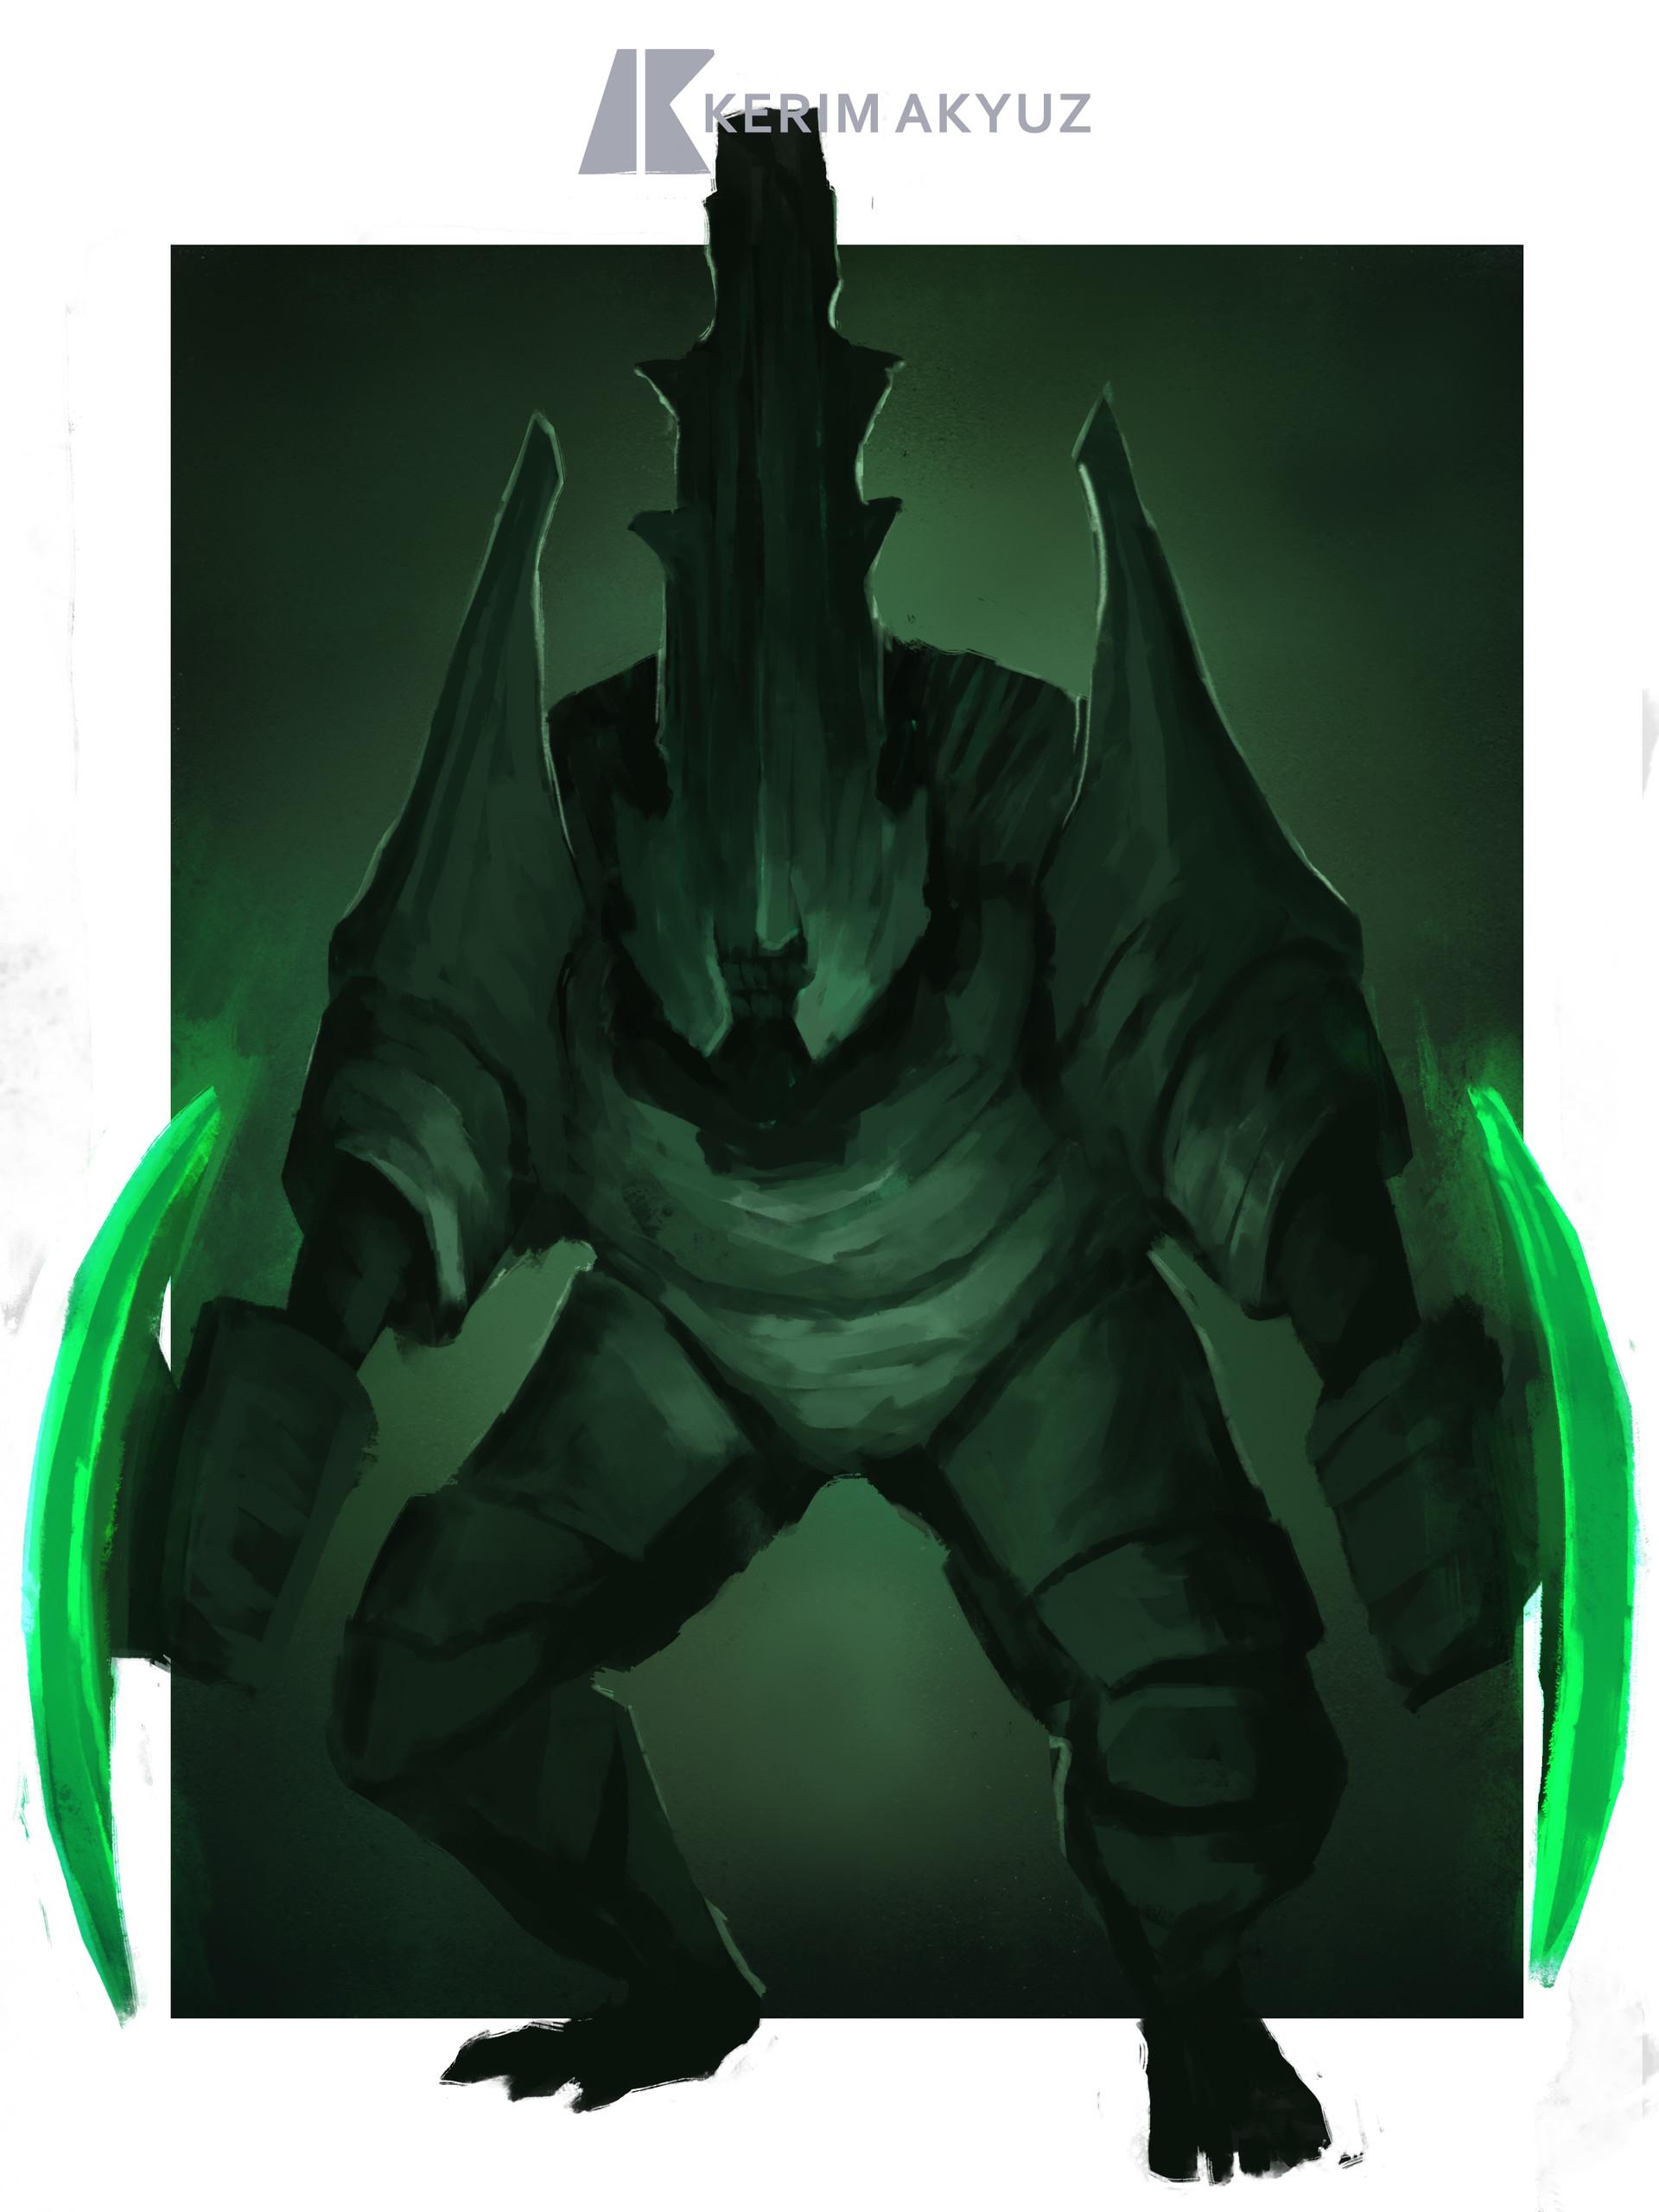 Kerim akyuz 104 emeraldgrunt